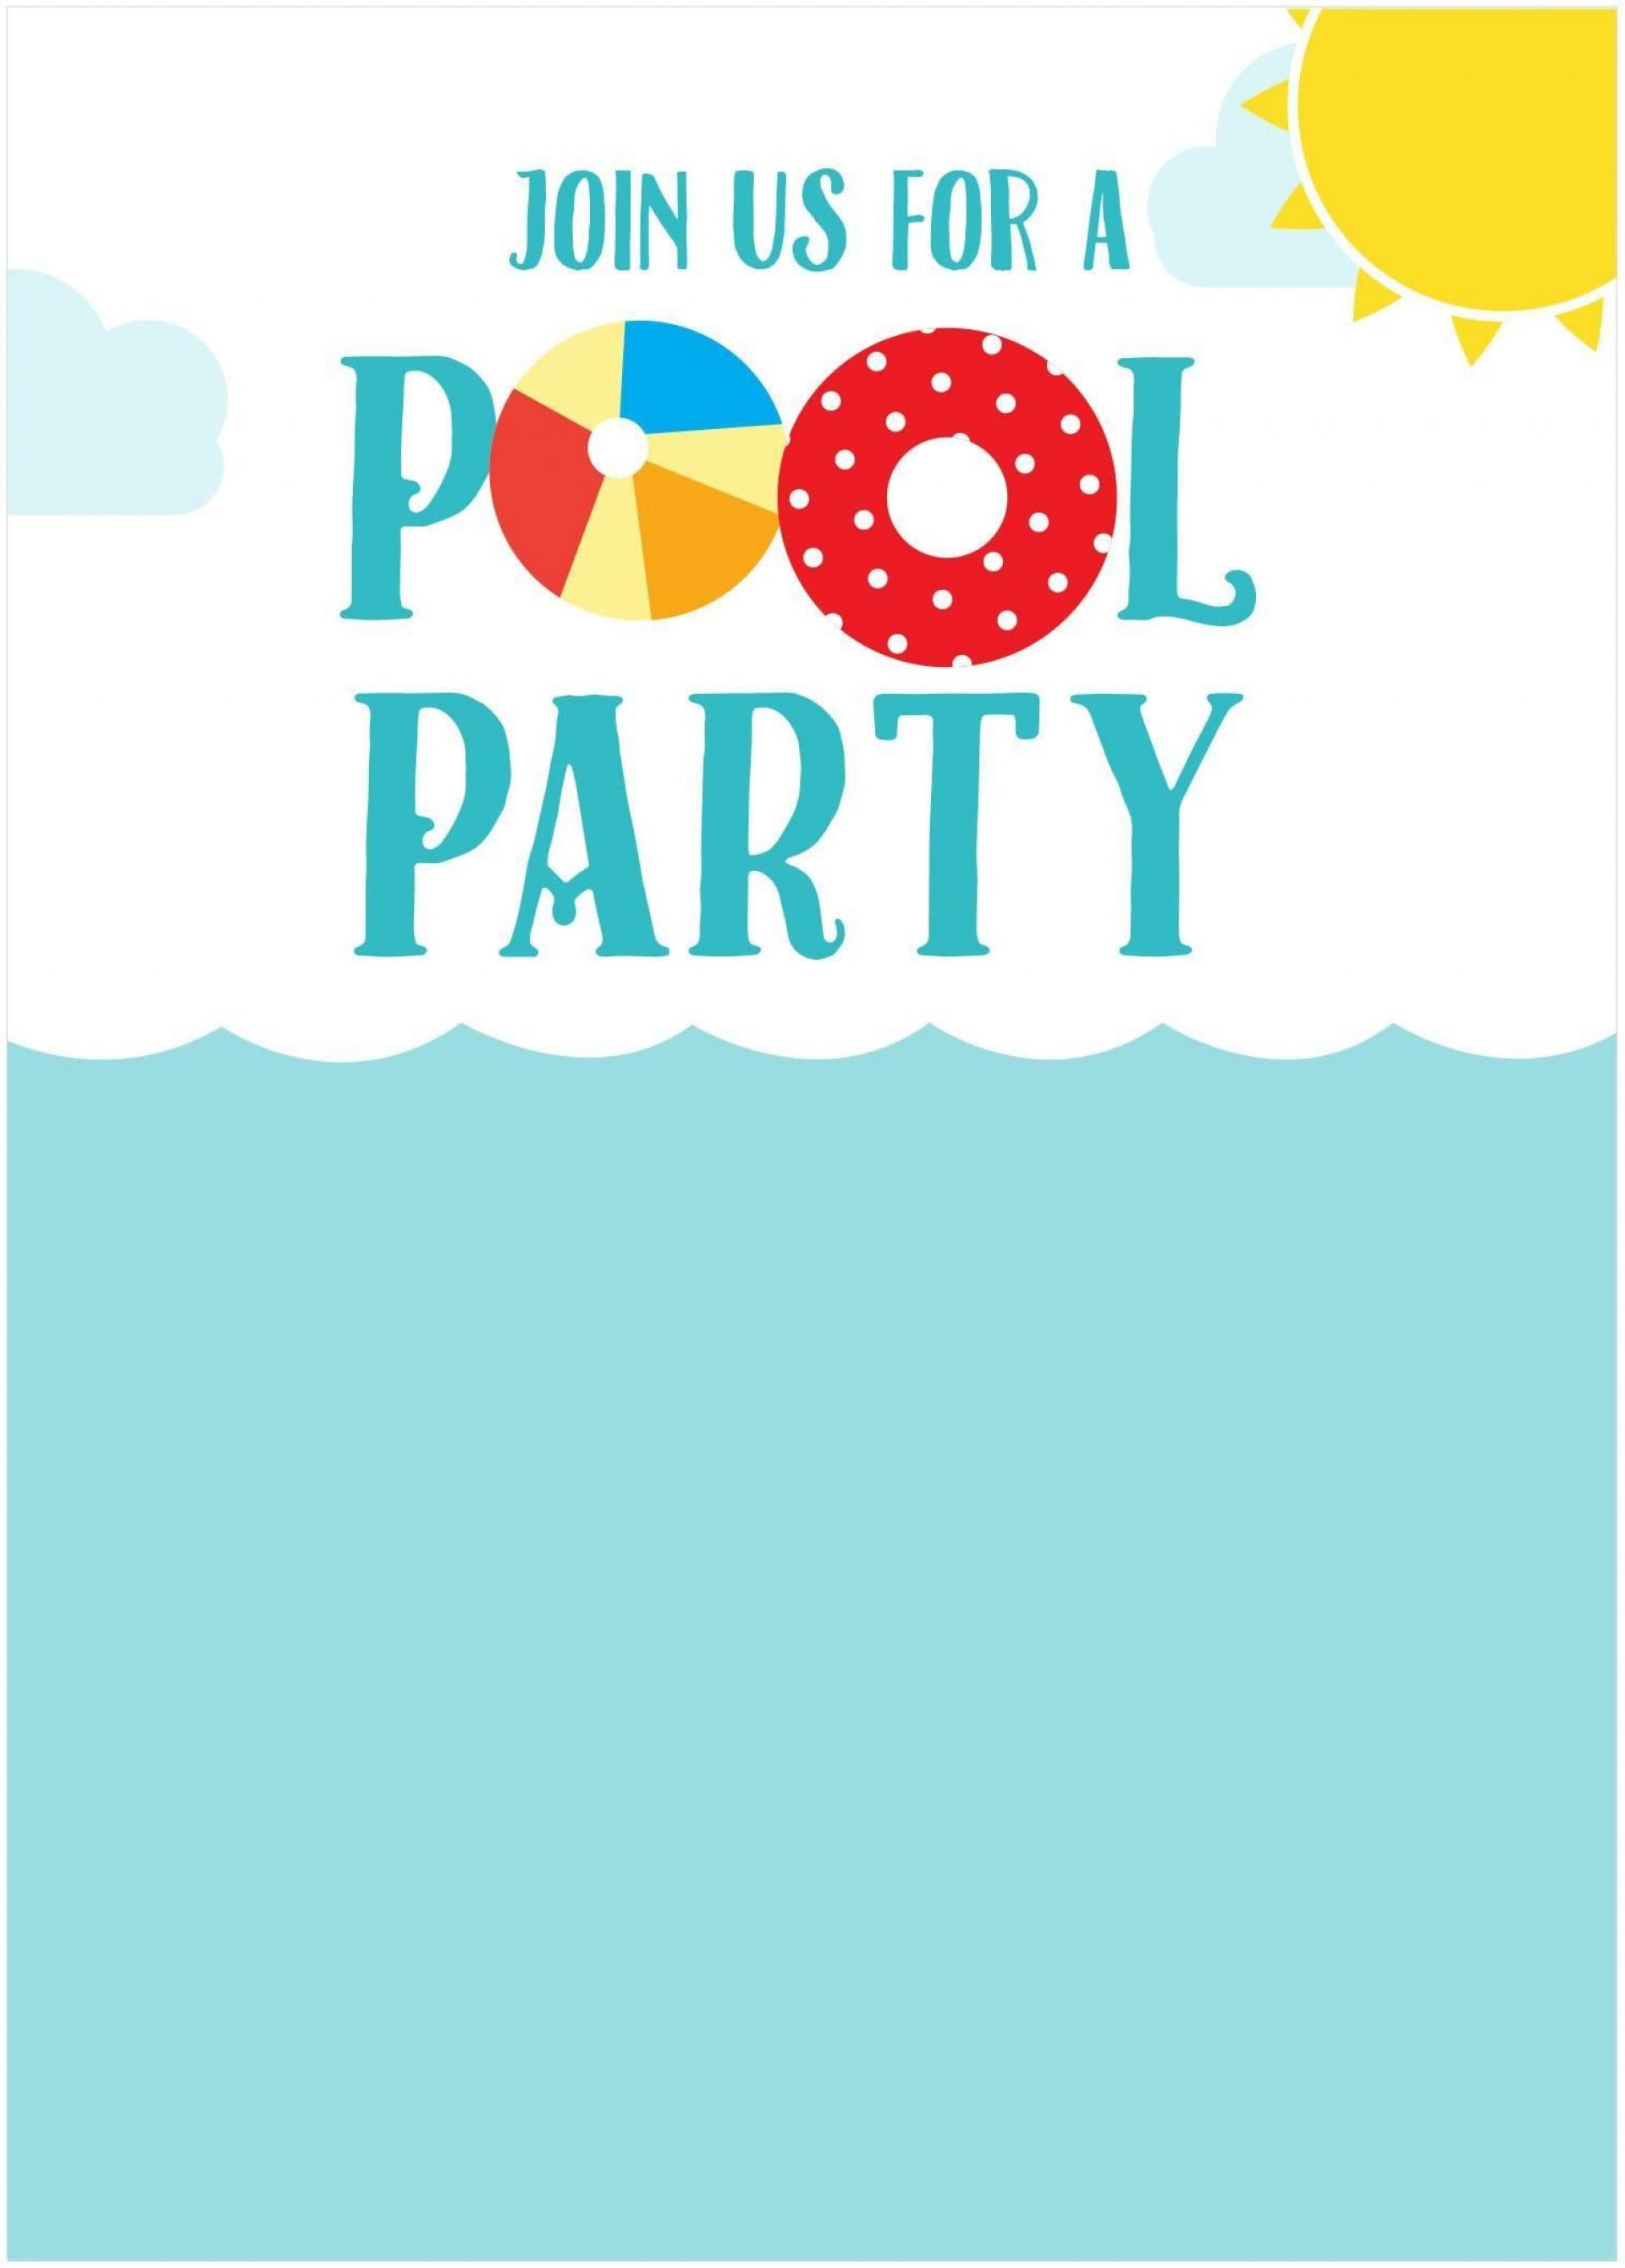 004 Impressive Party Invite Template Free Idea  Ugly Sweater Invitation Word Christma Printable Swimming Uk1920